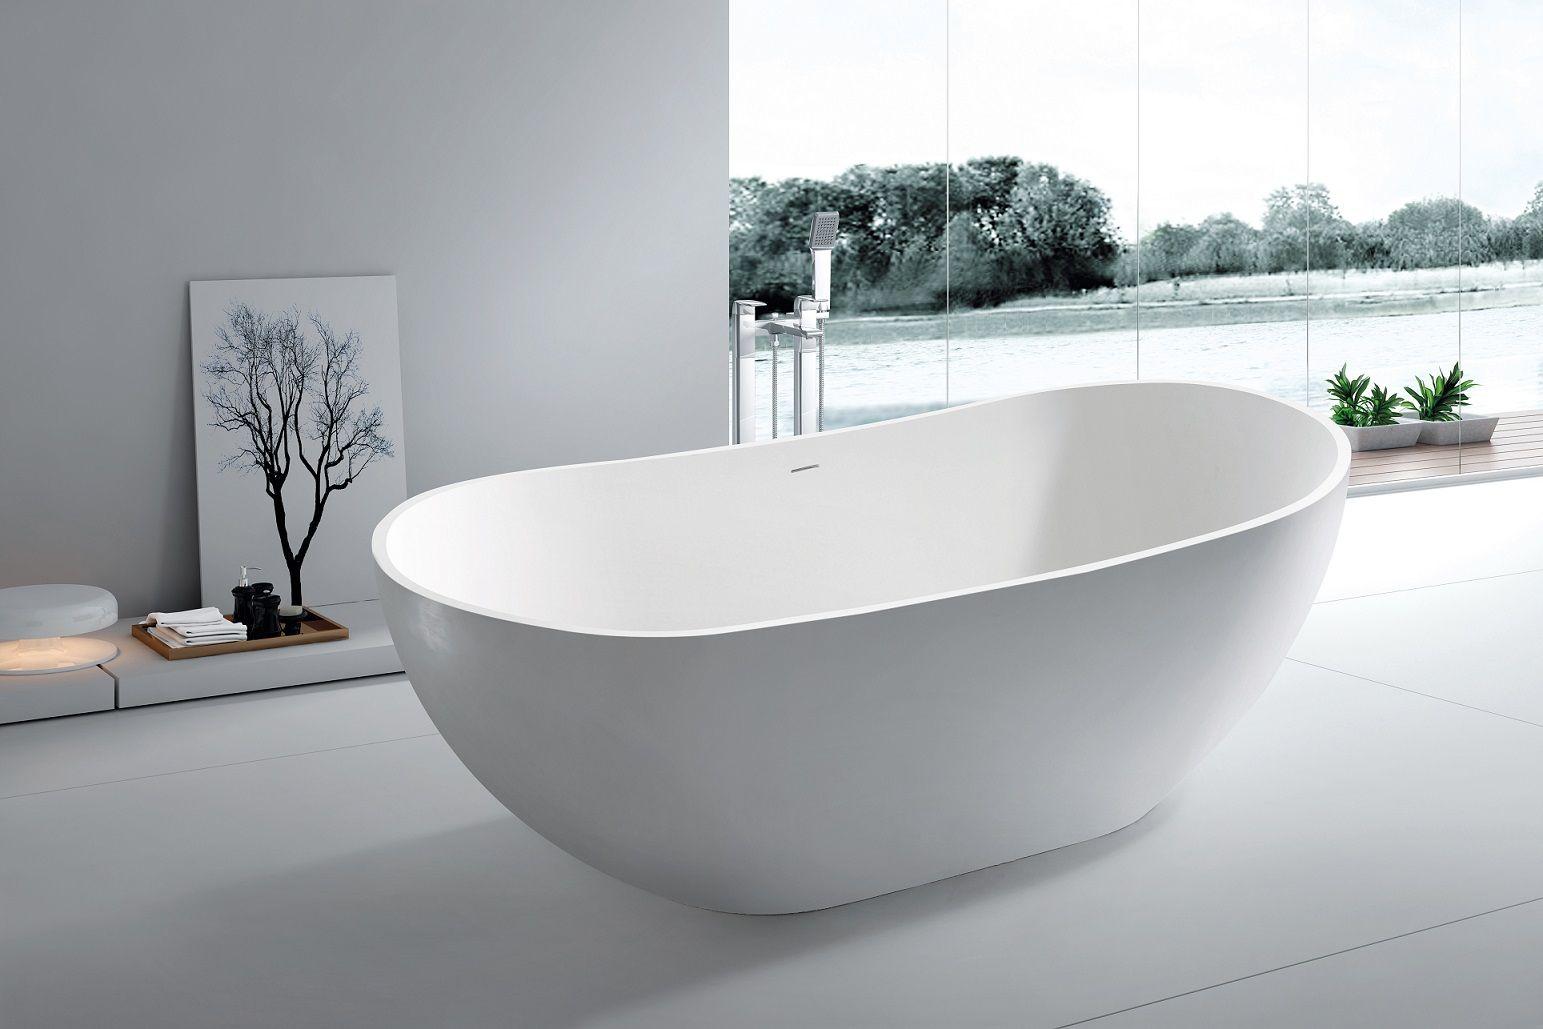 Aalish Freestanding Soaking Tub 64 Contemporary Bathtubs